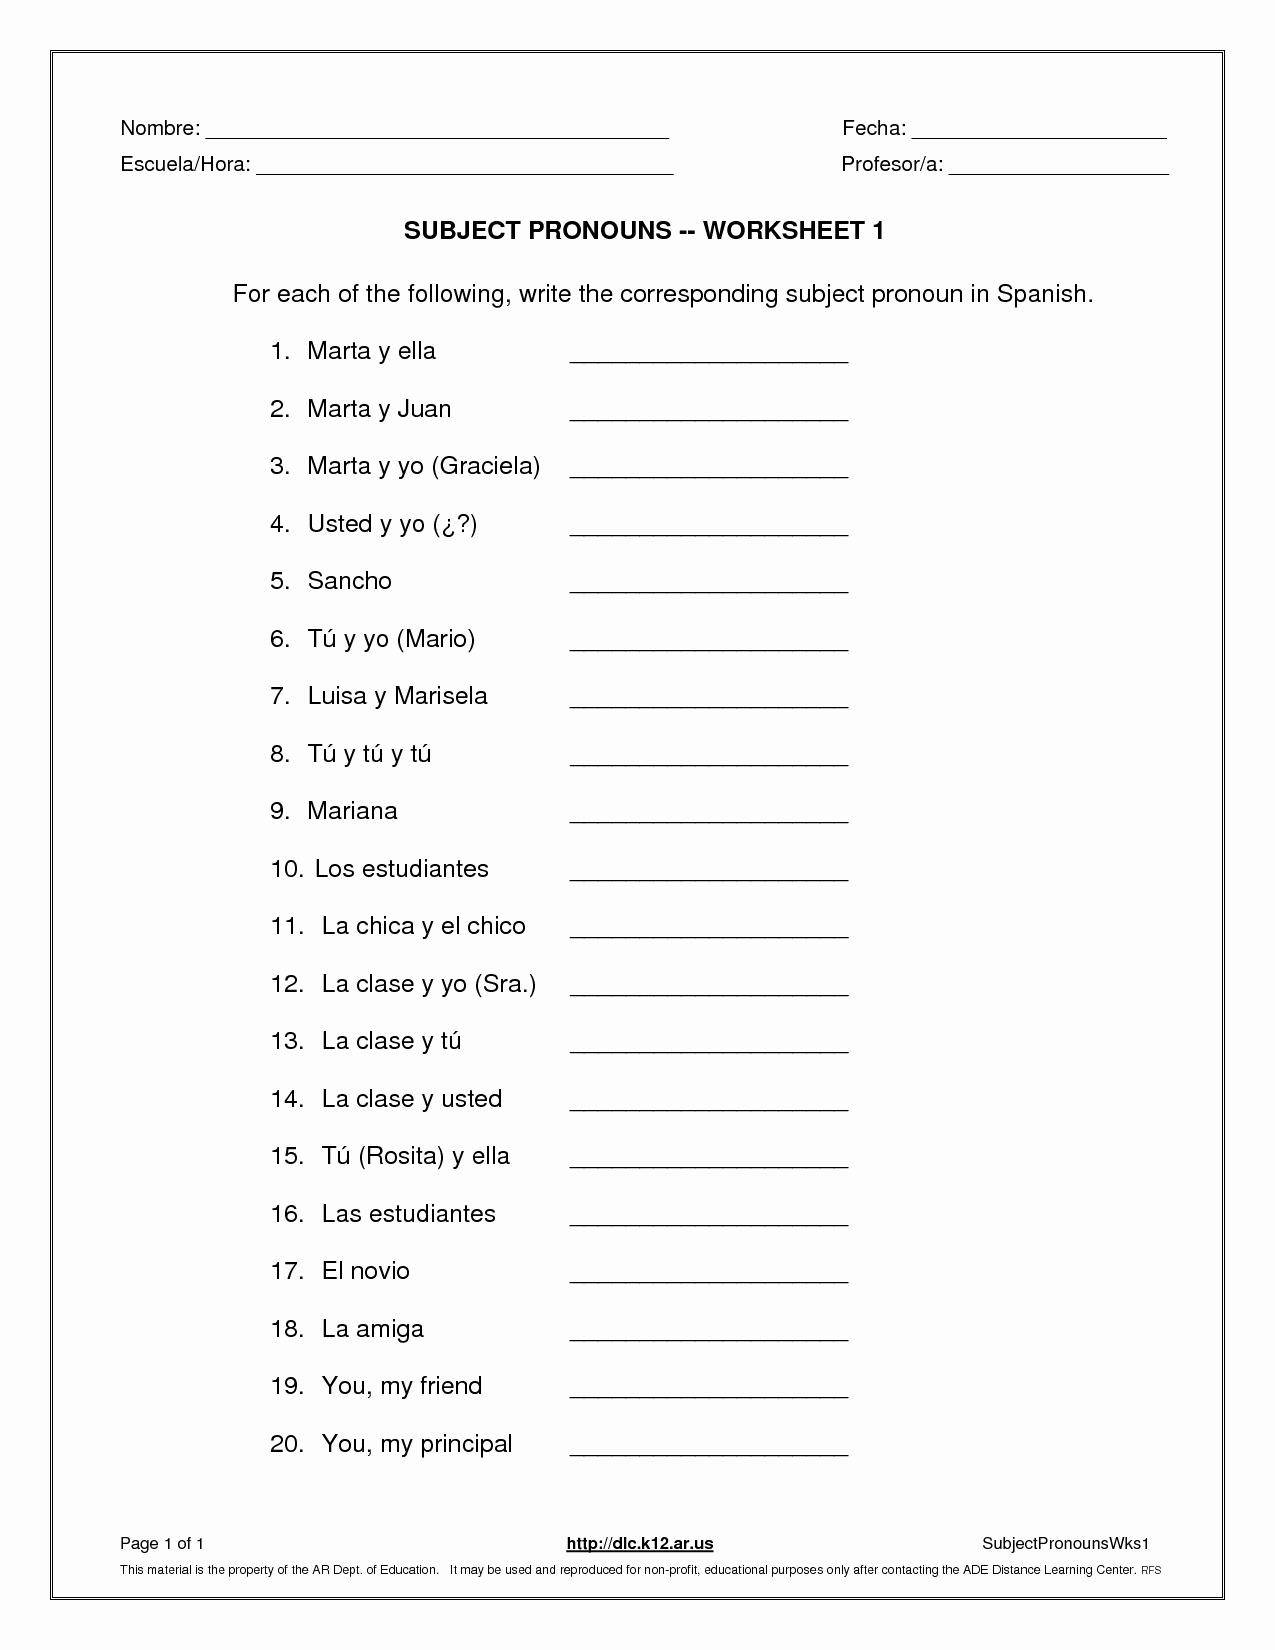 Free Pronoun Worksheets New 15 Best Of Proper Pronouns Worksheets 2nd Grade